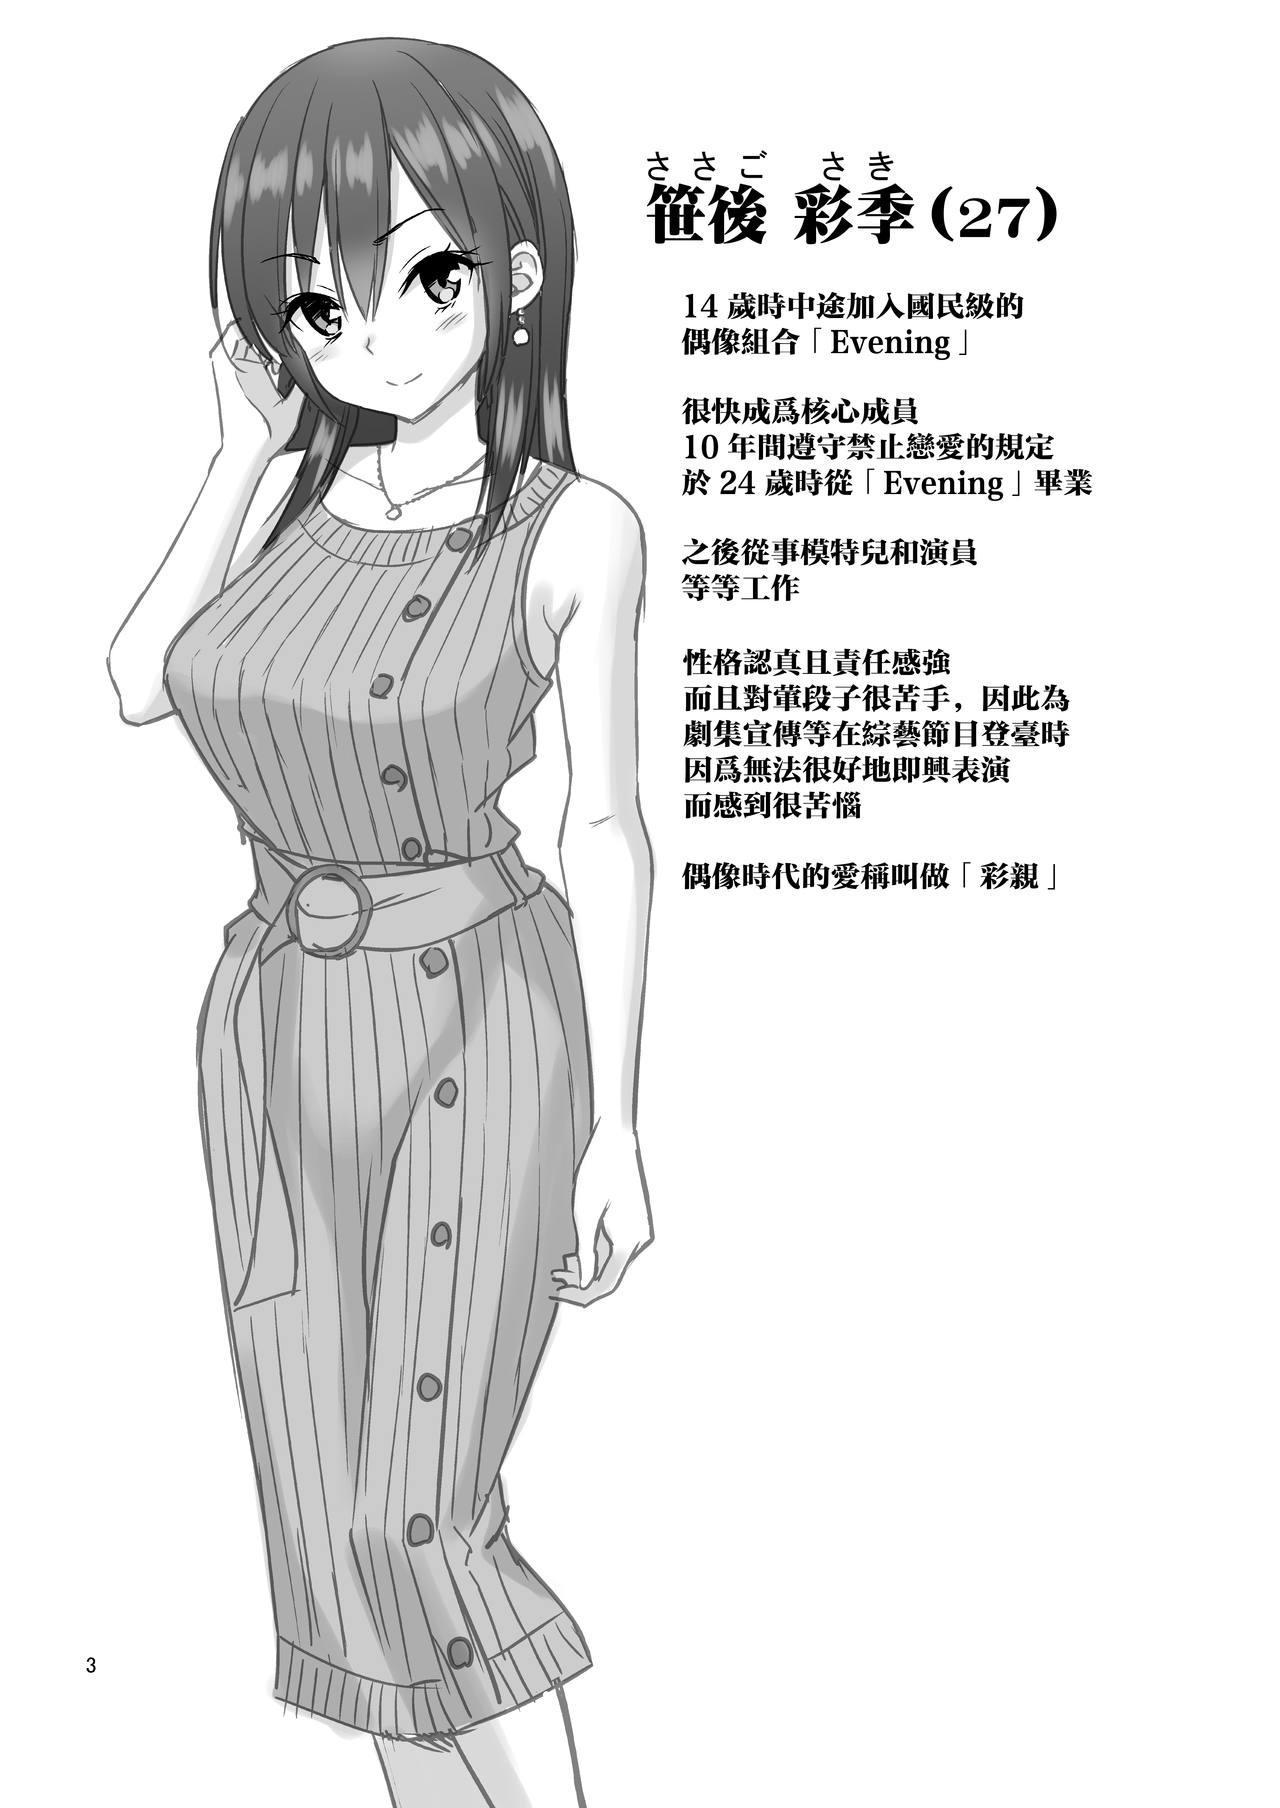 [Popochichi (Yahiro Pochi)] Gisou Manbiki ~Nerawareta Moto Idol Tsuma~ | 偽裝竊盜~被狙擊的前偶像人妻~ [Chinese] [路过的骑士汉化组] [Digital] 2